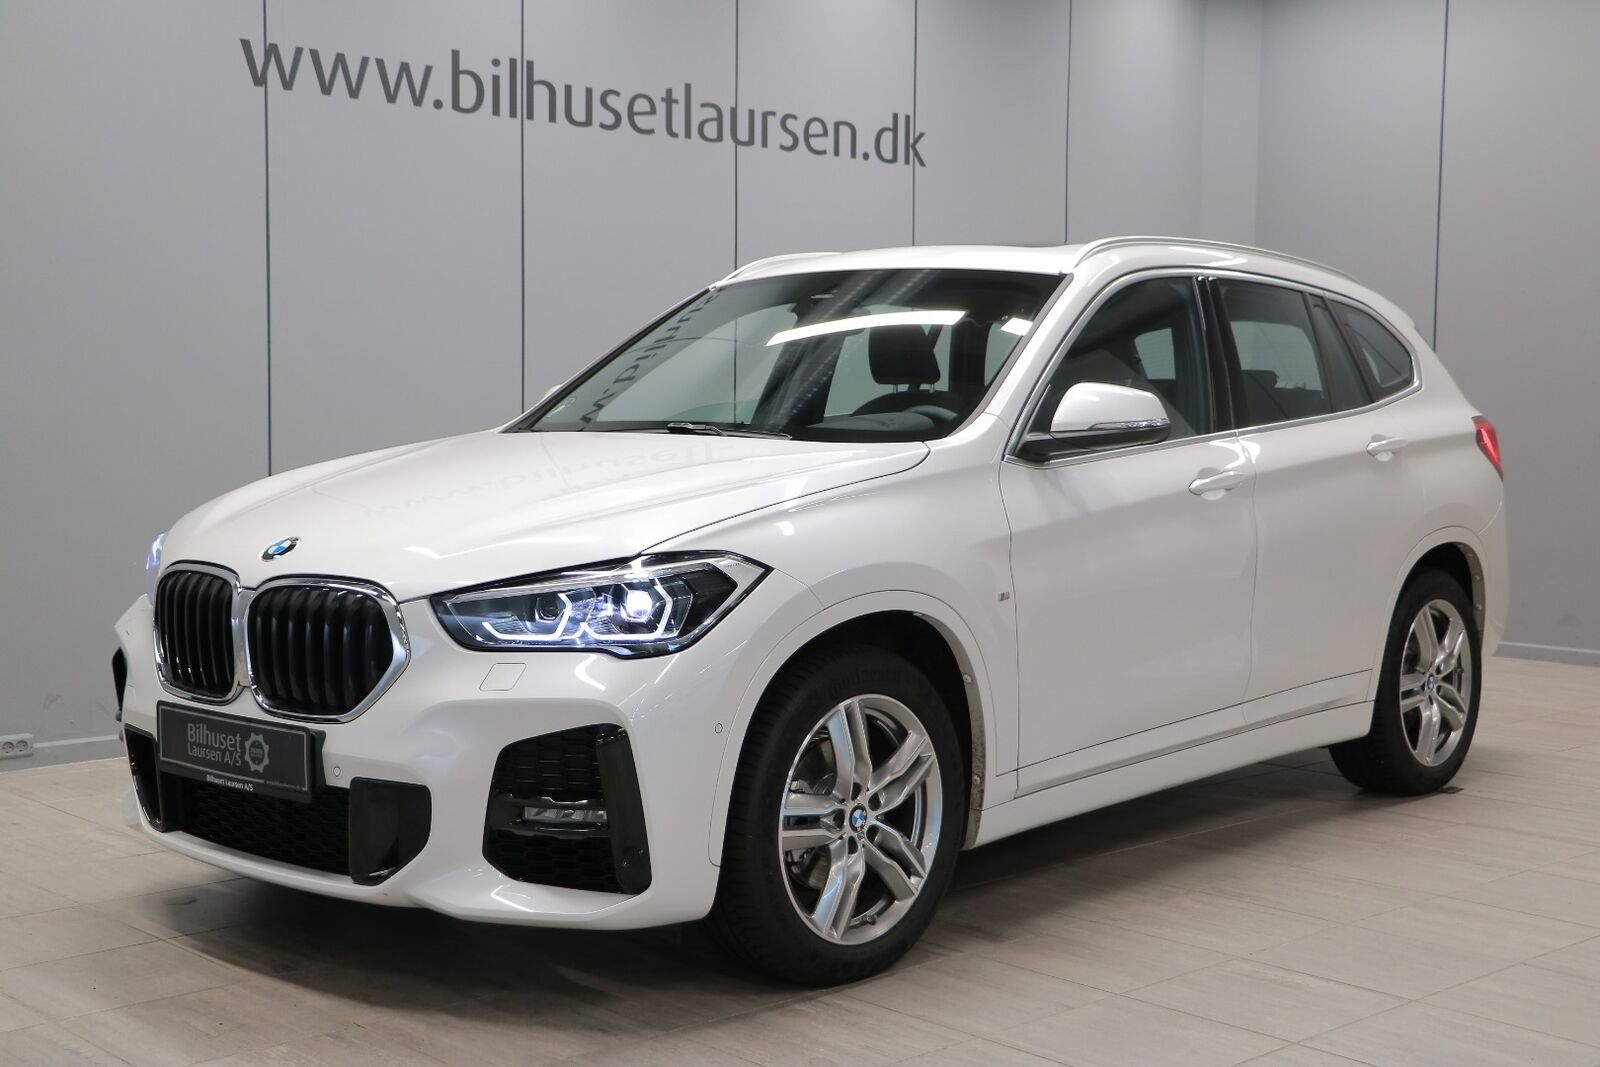 BMW X1 1,5 sDrive18i M-Sport aut. 5d - 467.900 kr.